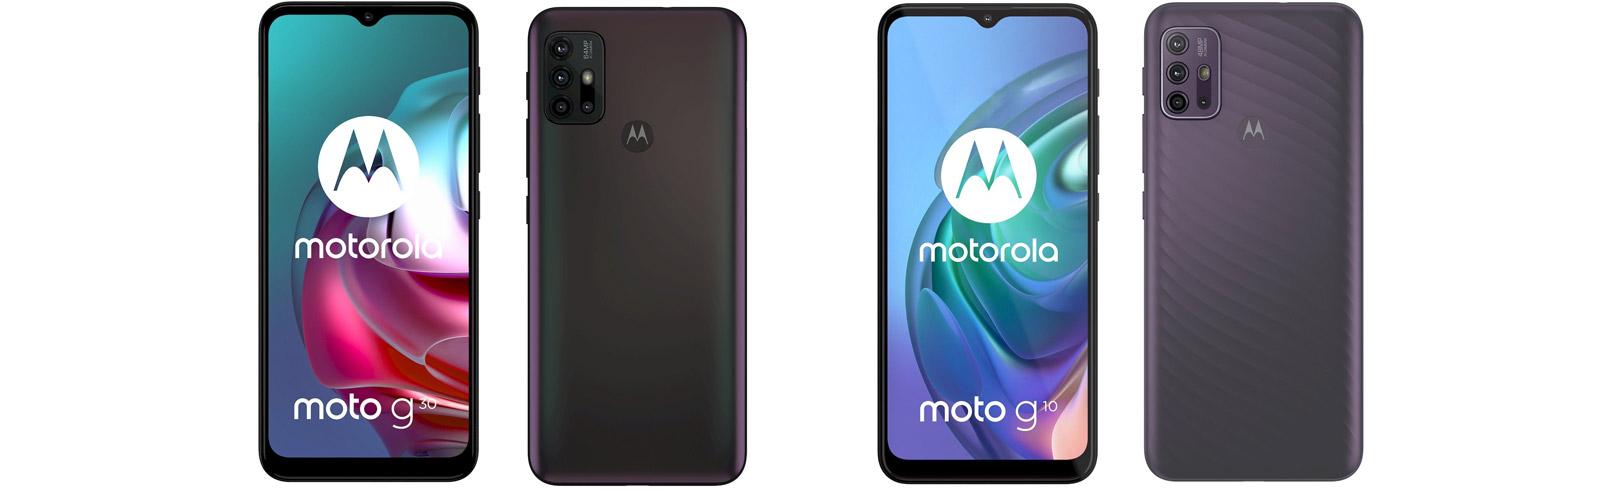 Moto G10 and Moto G30: Motorola renews its mid-low range